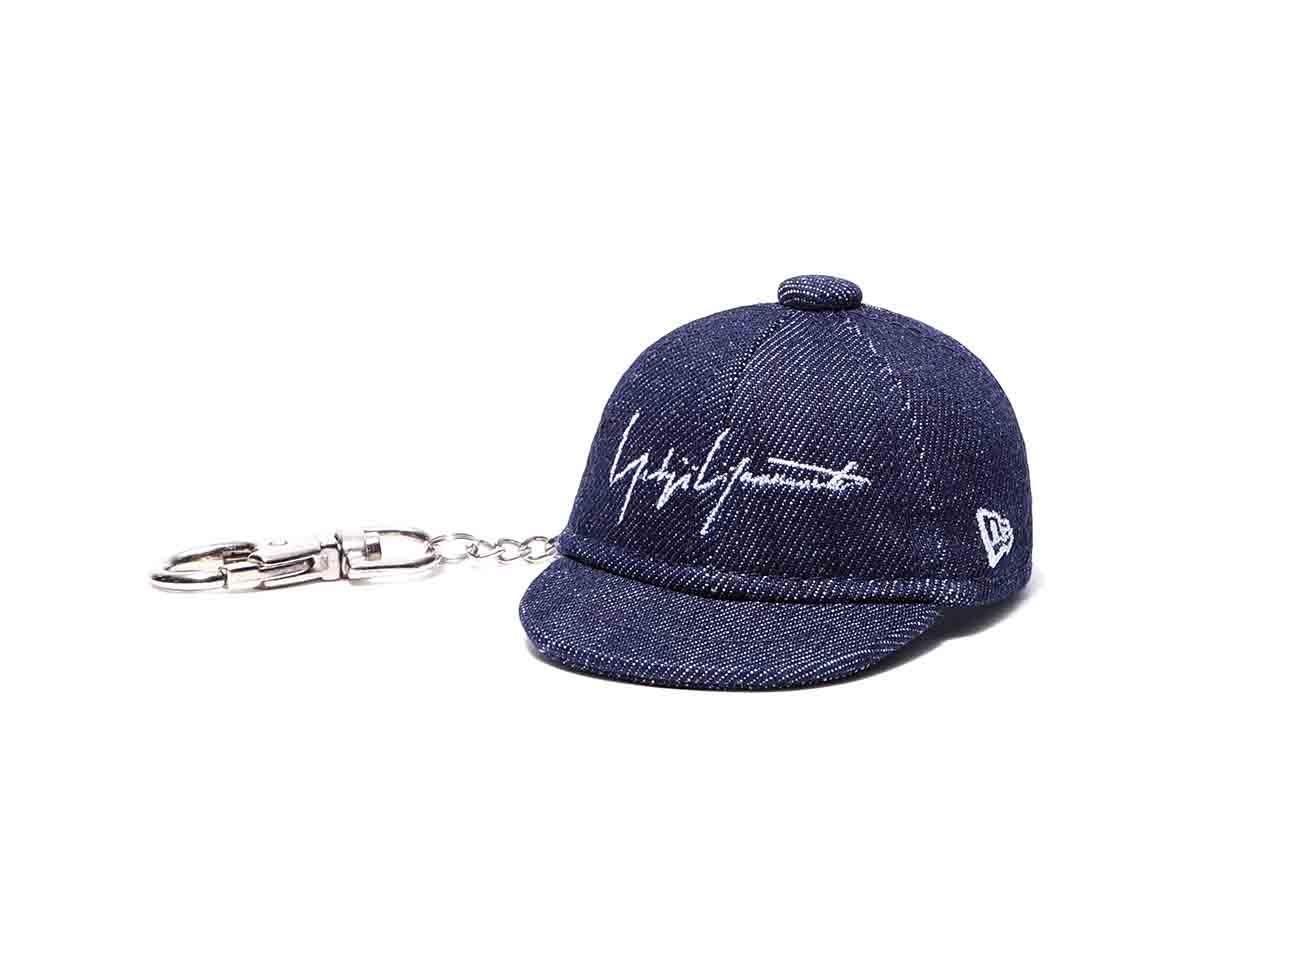 Yohji Yamamoto × New Era BLACK SERGE CAP KEYHOLDER DENIM